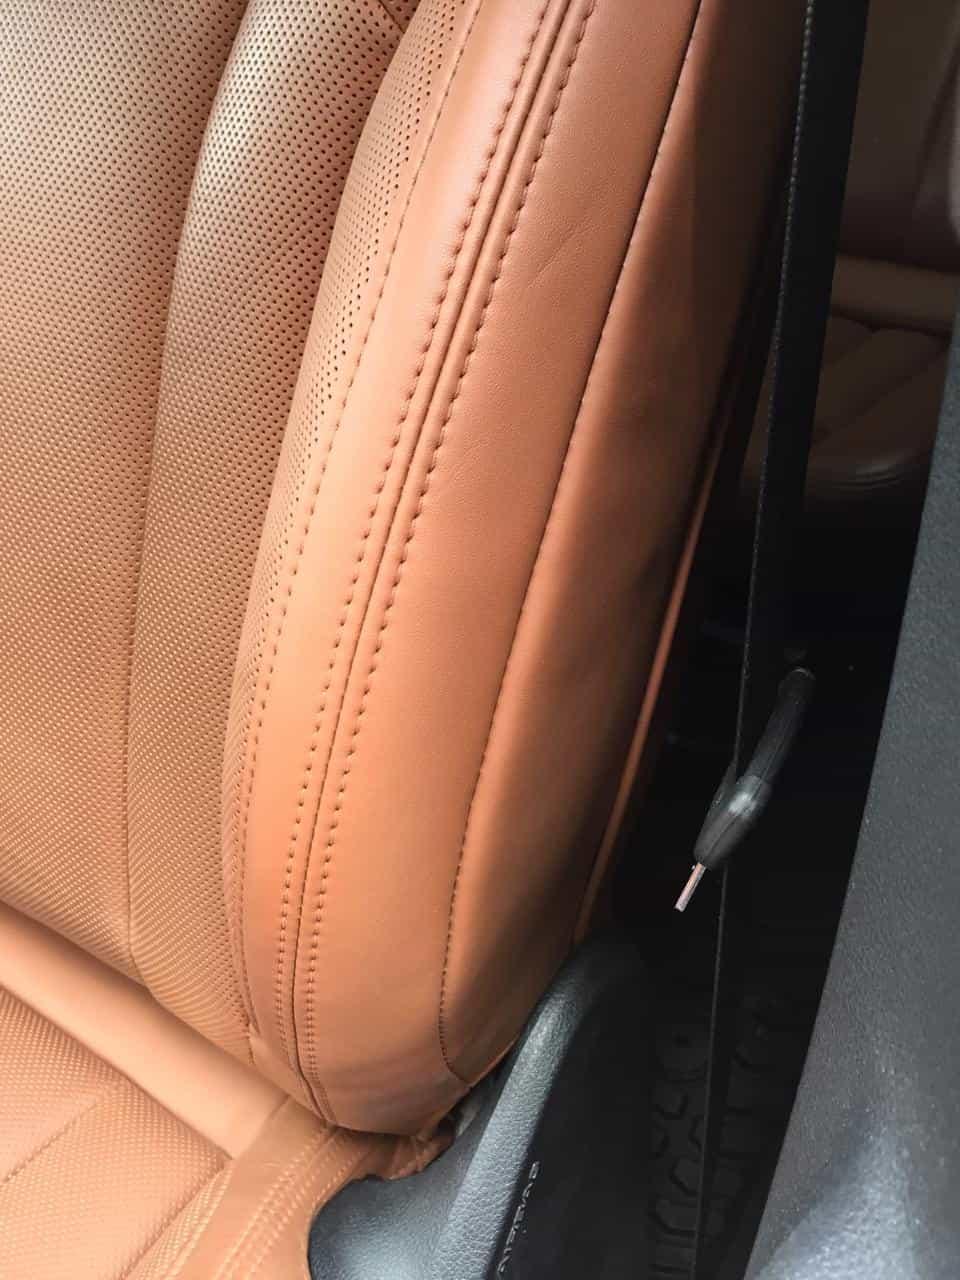 Реставрация сидений Ауди Q7 777